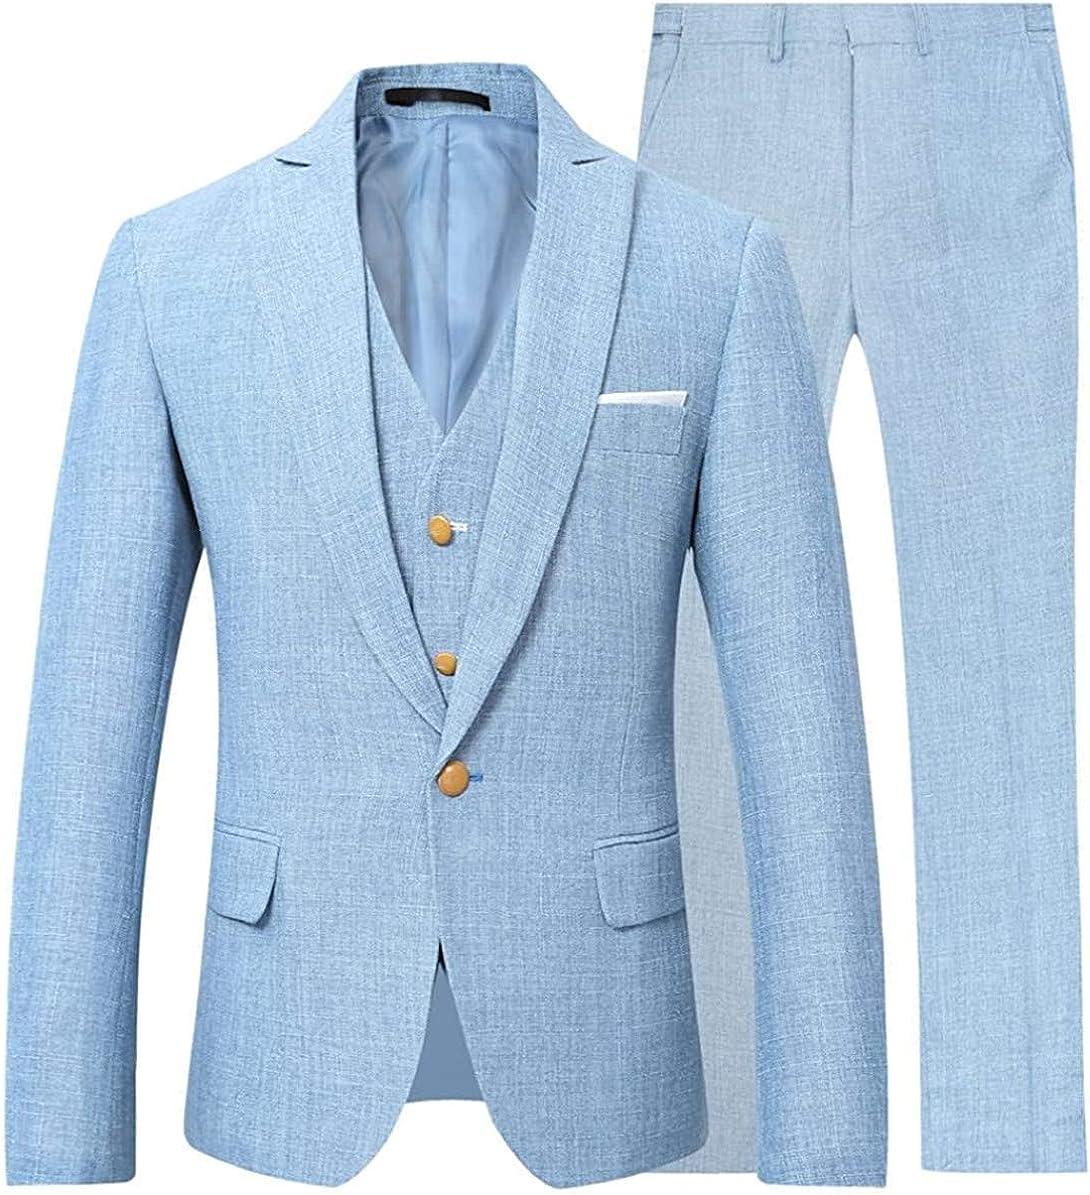 Mens Linen Beach Suit Wedding Groom Prom Slim Fit Party 3 Pieces Suits